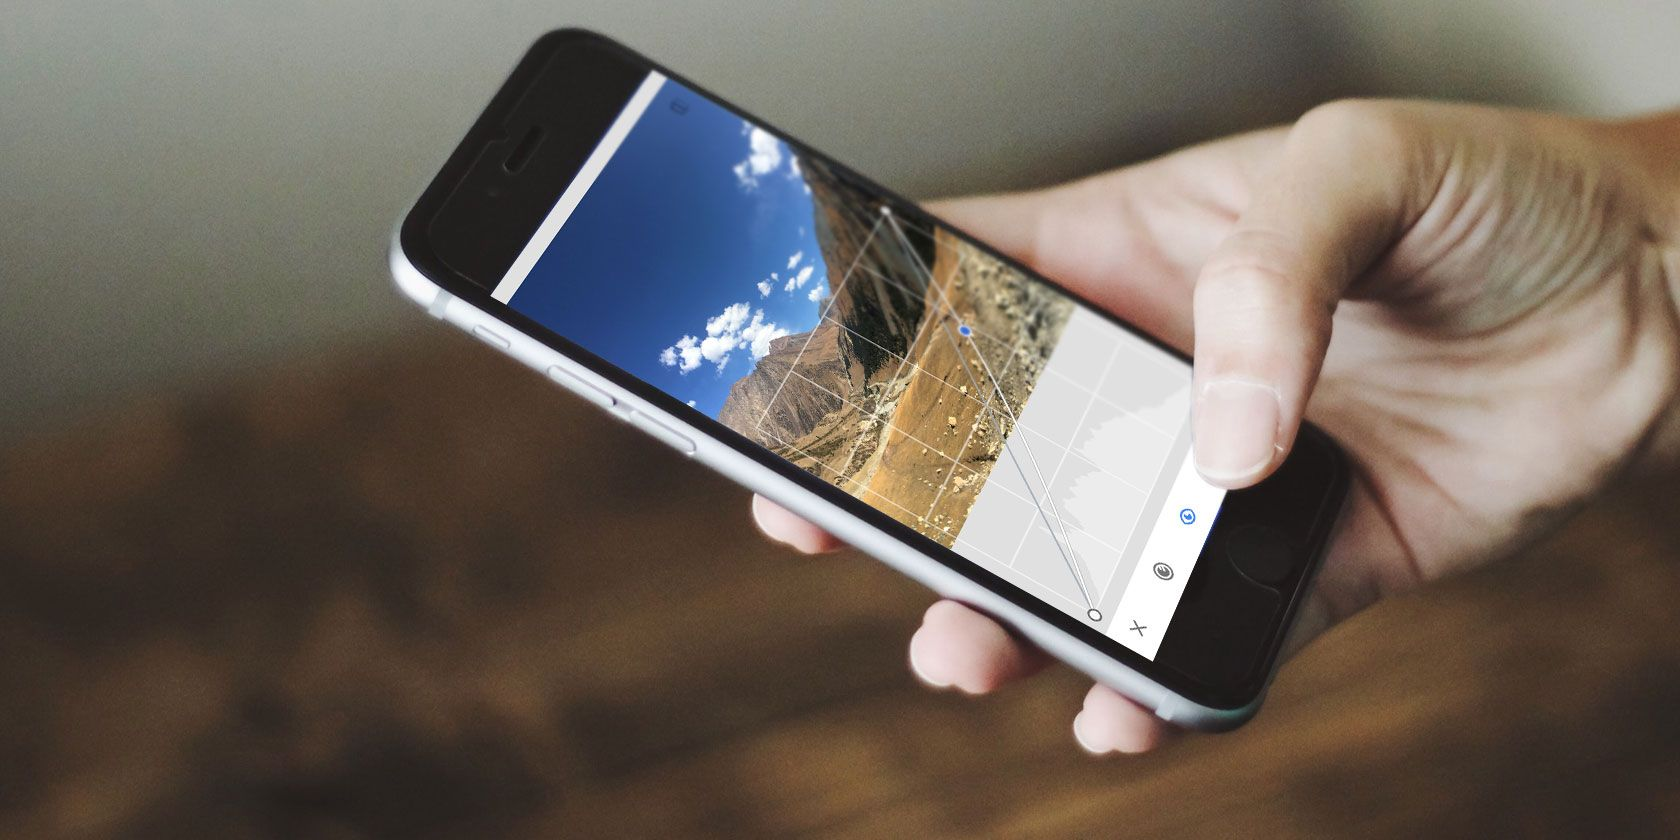 besft-free-photo-edit-iphone